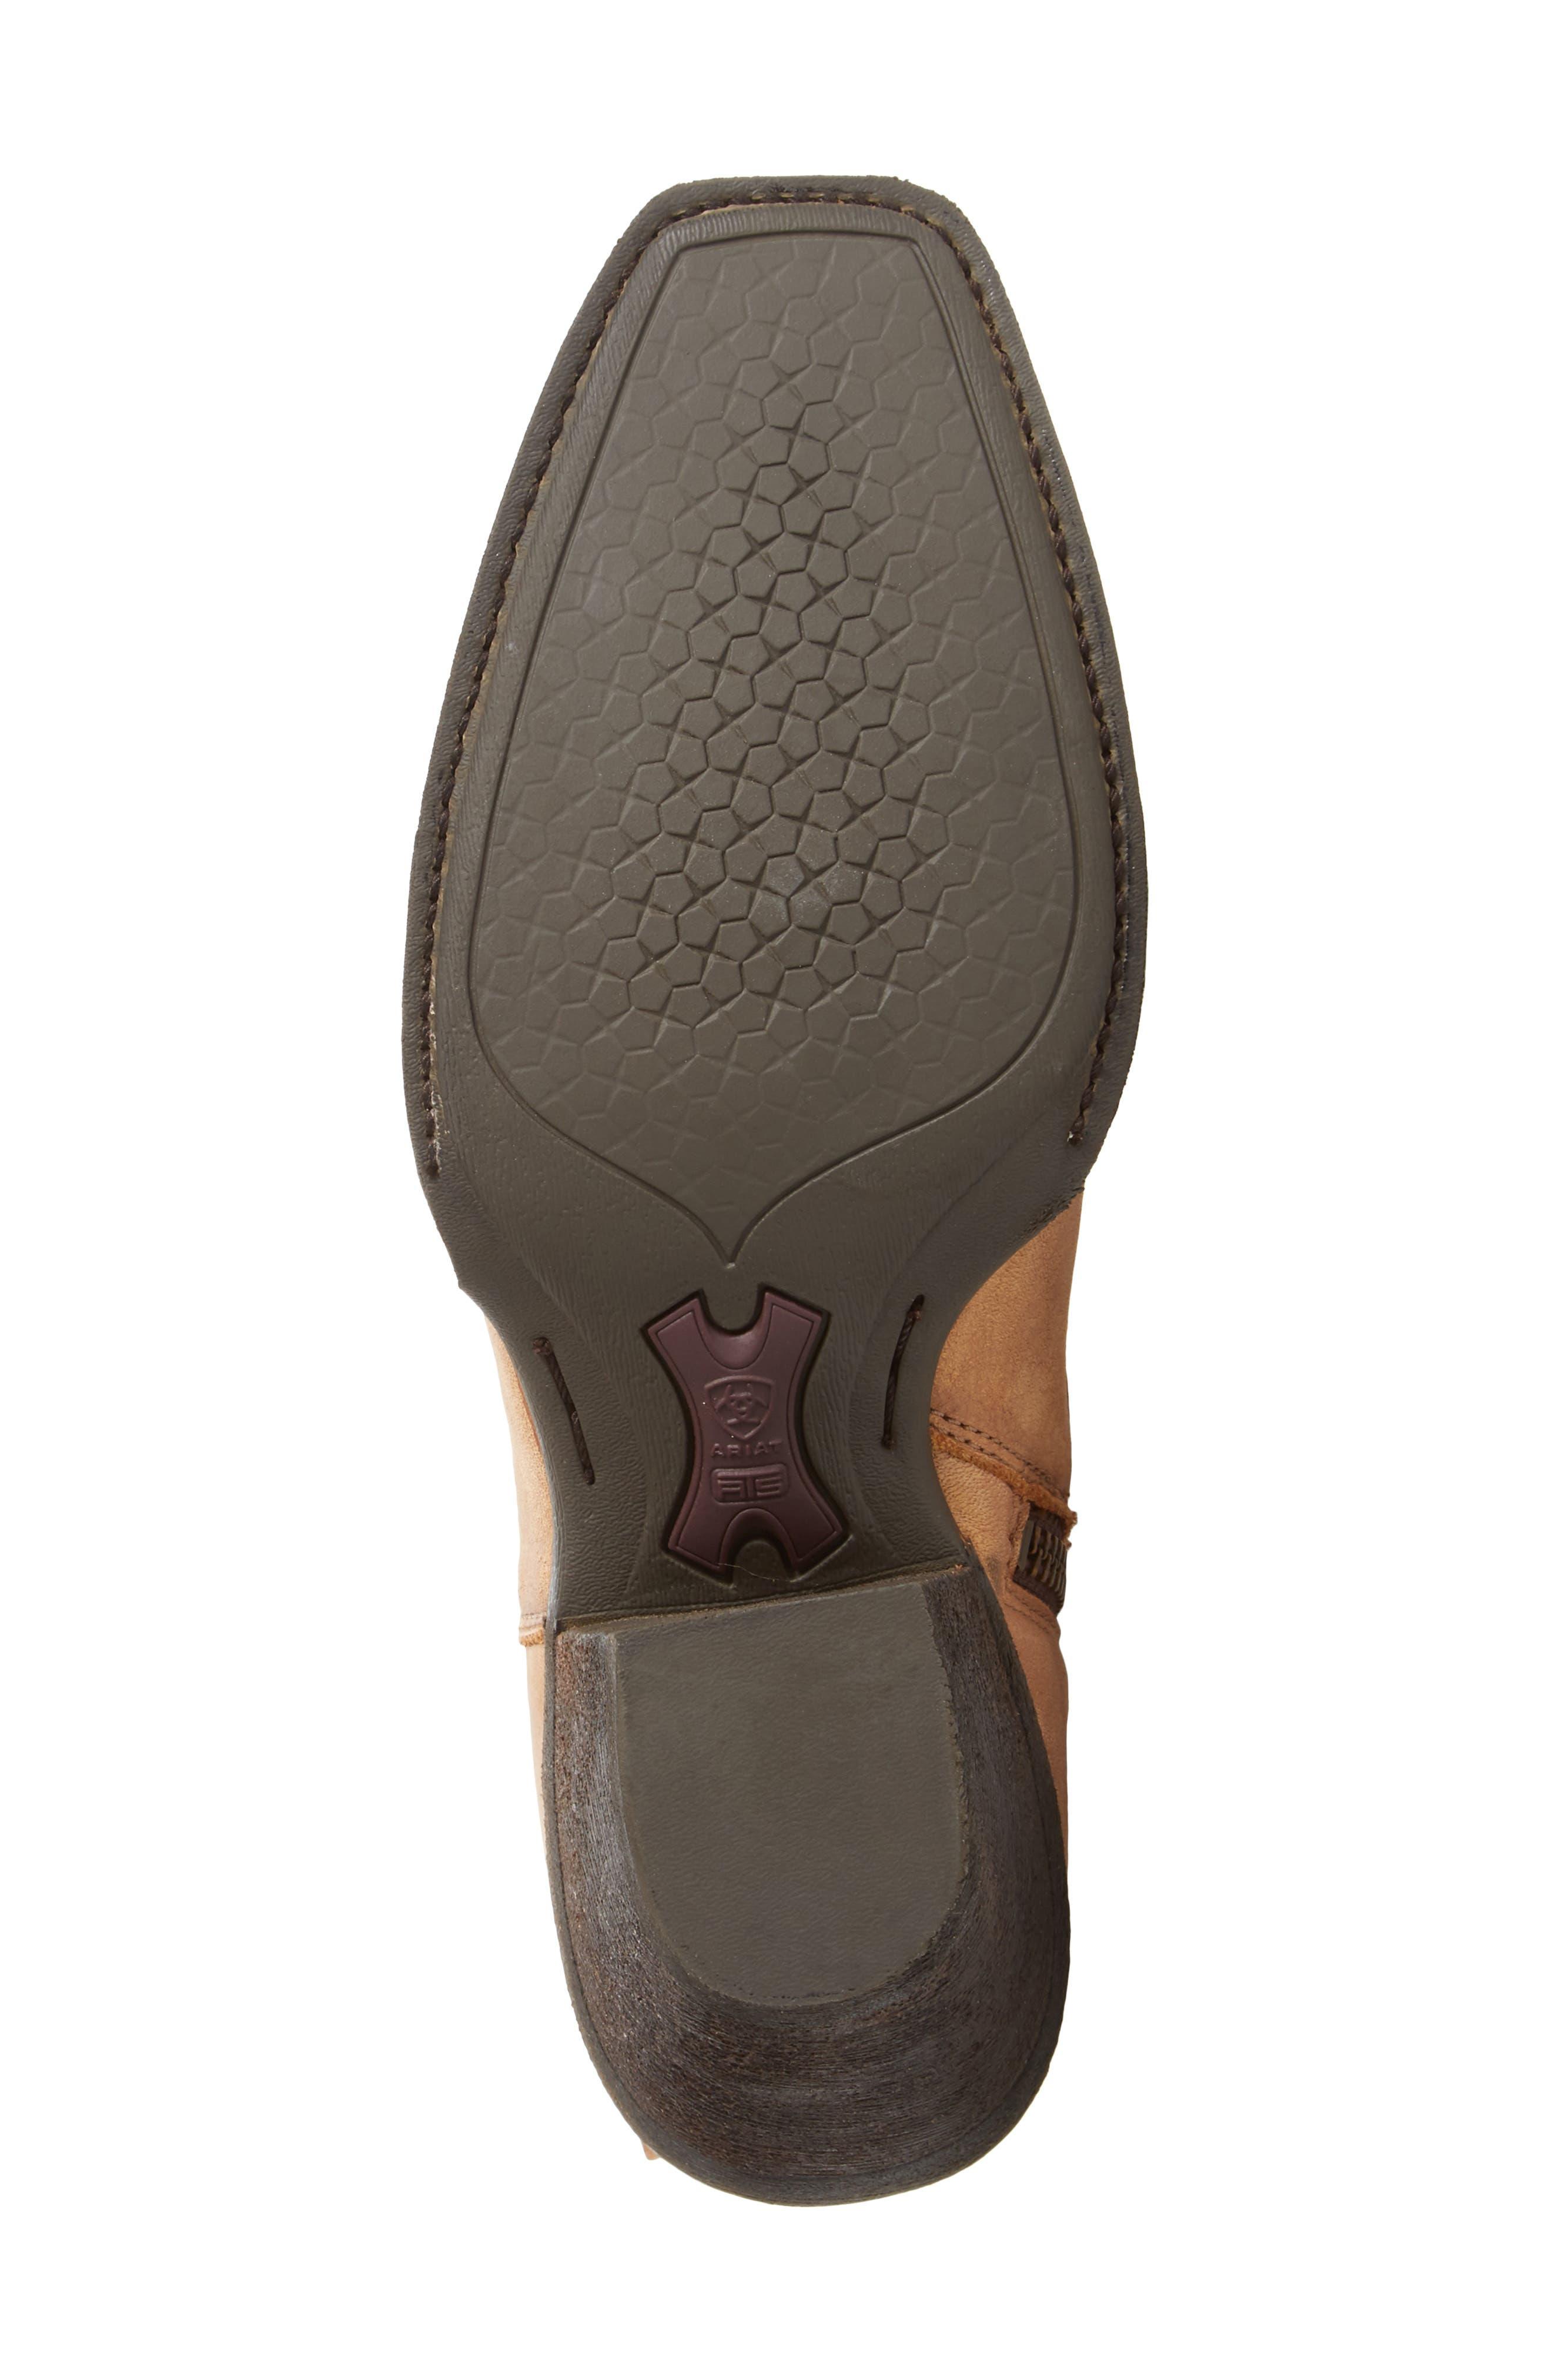 Leyton Fringe Western Boot,                             Alternate thumbnail 6, color,                             Tack Room Honey Leather